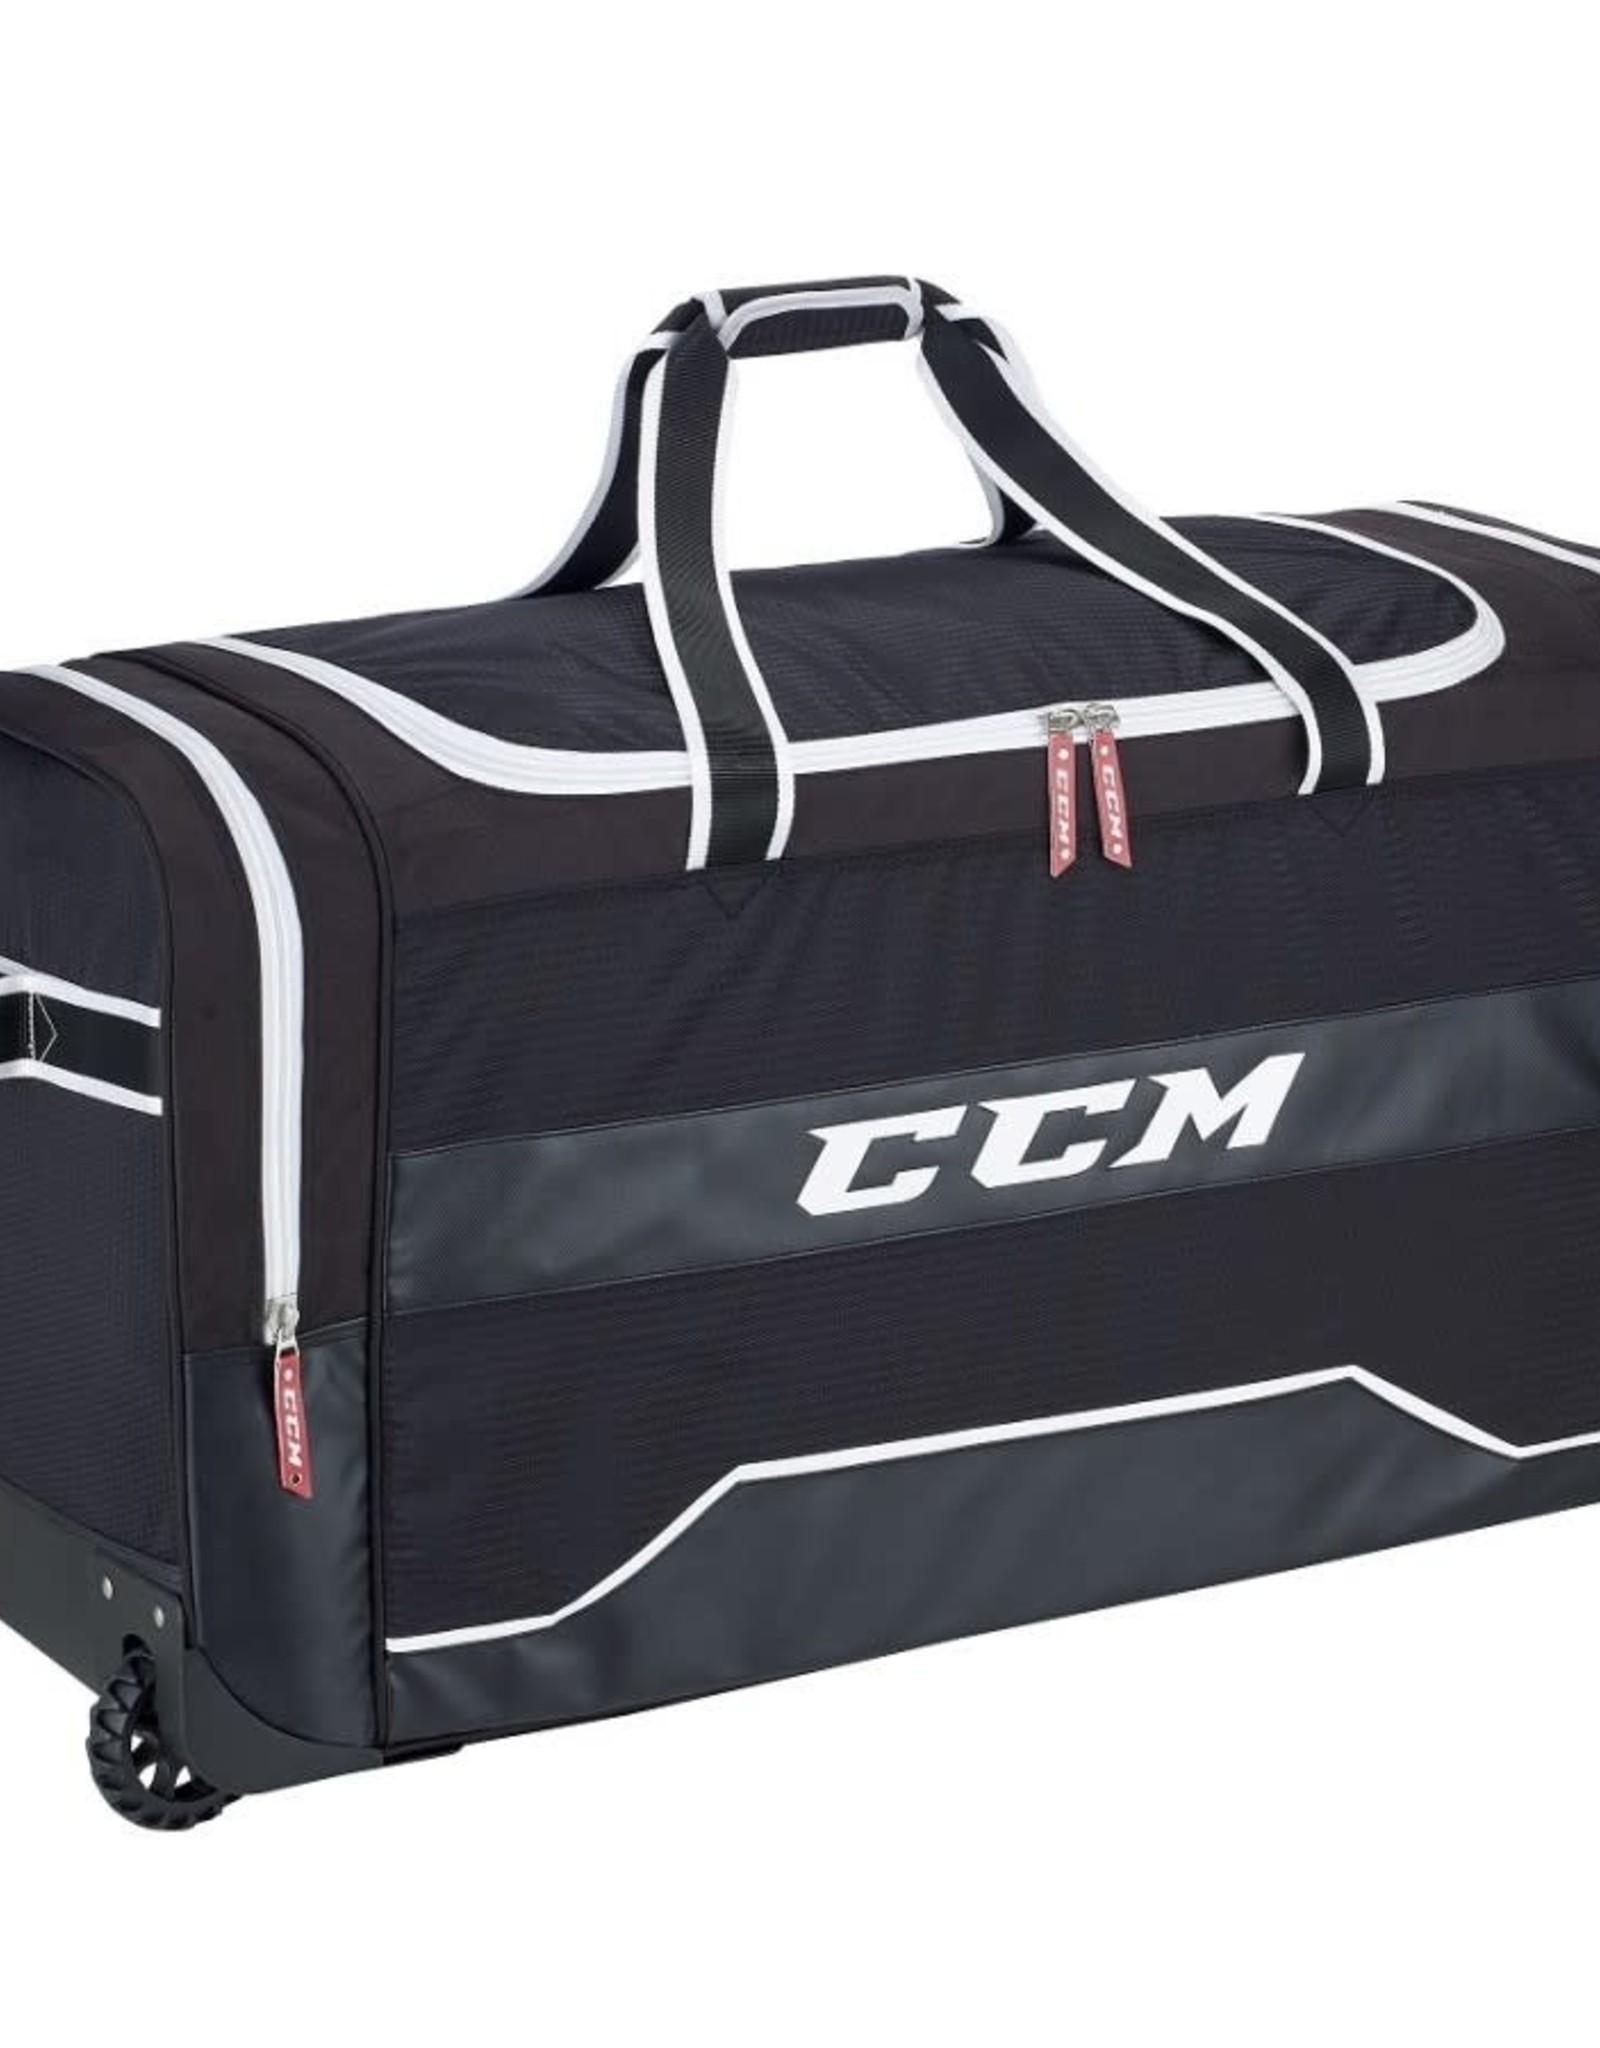 CCM 380 Delux Wheel Bag